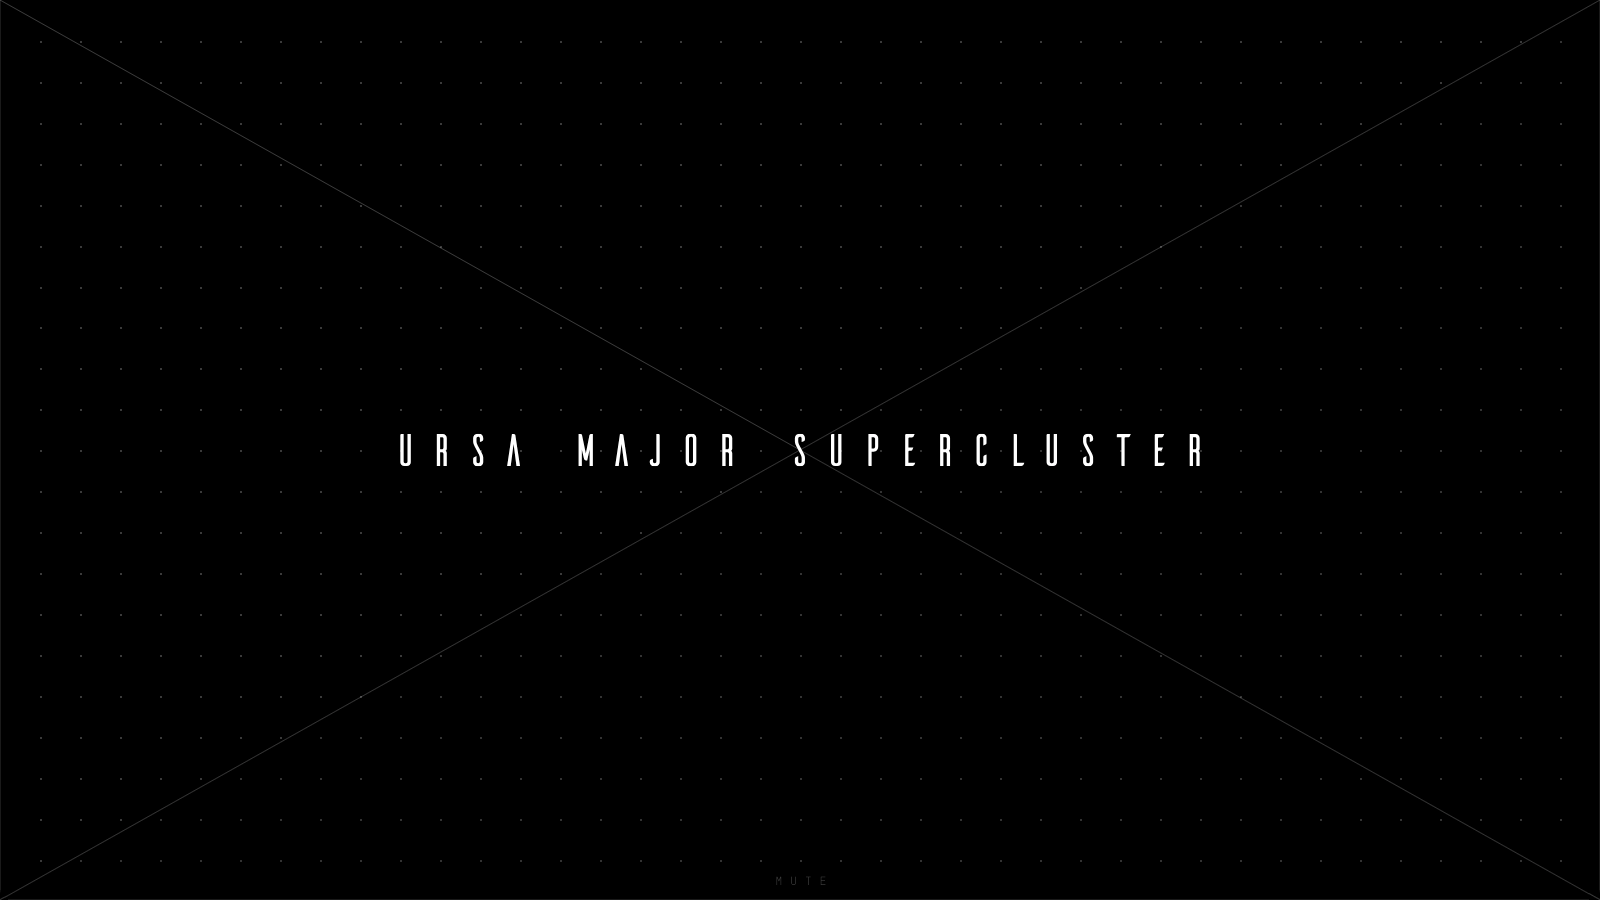 Ursa Major Supercluster